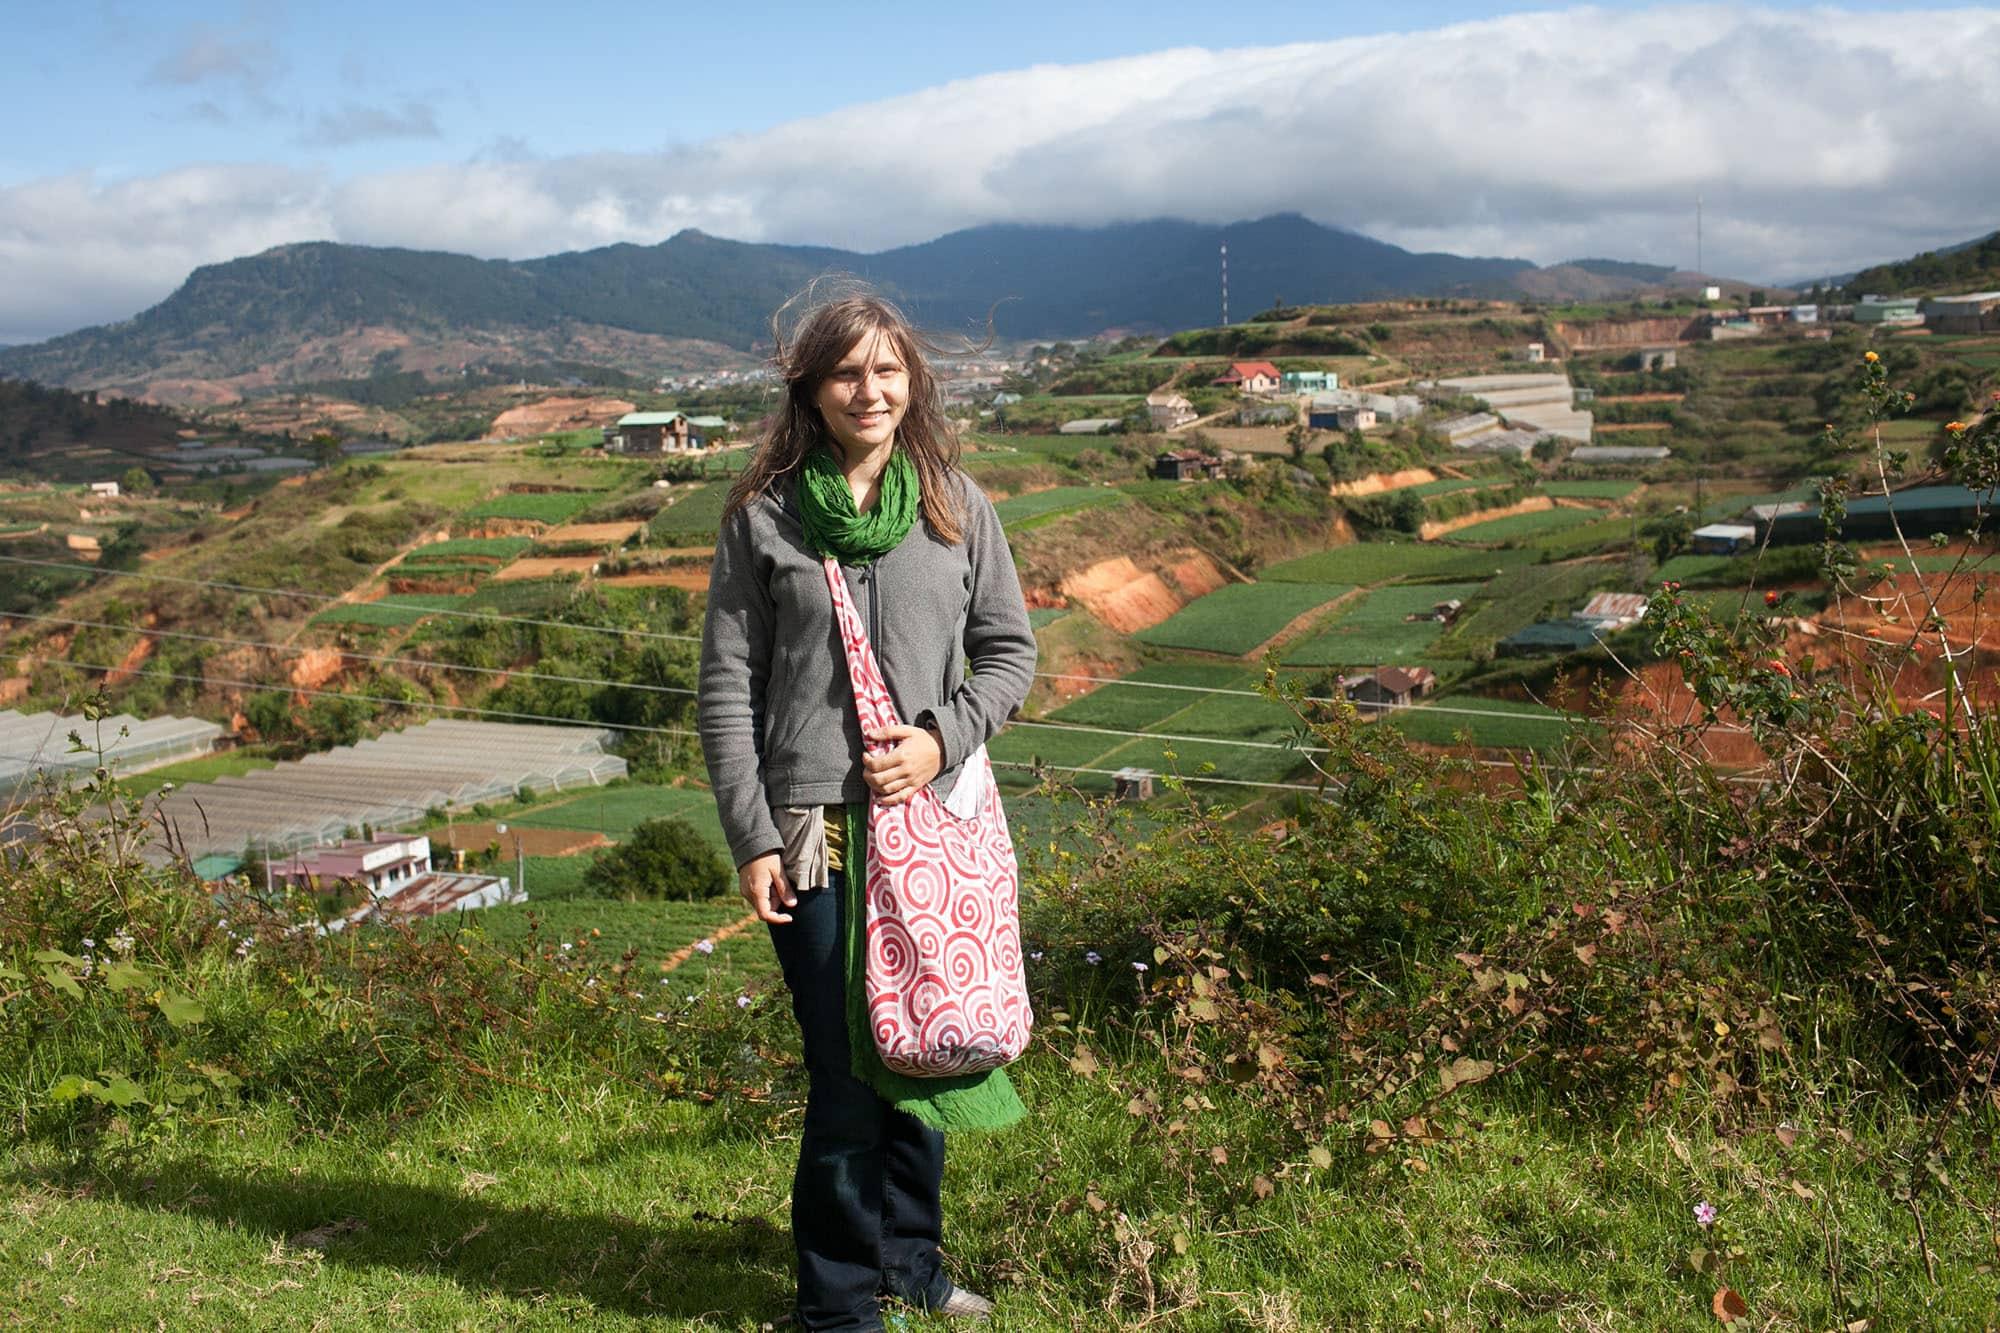 Countryside tour of Dalat, Vietnam